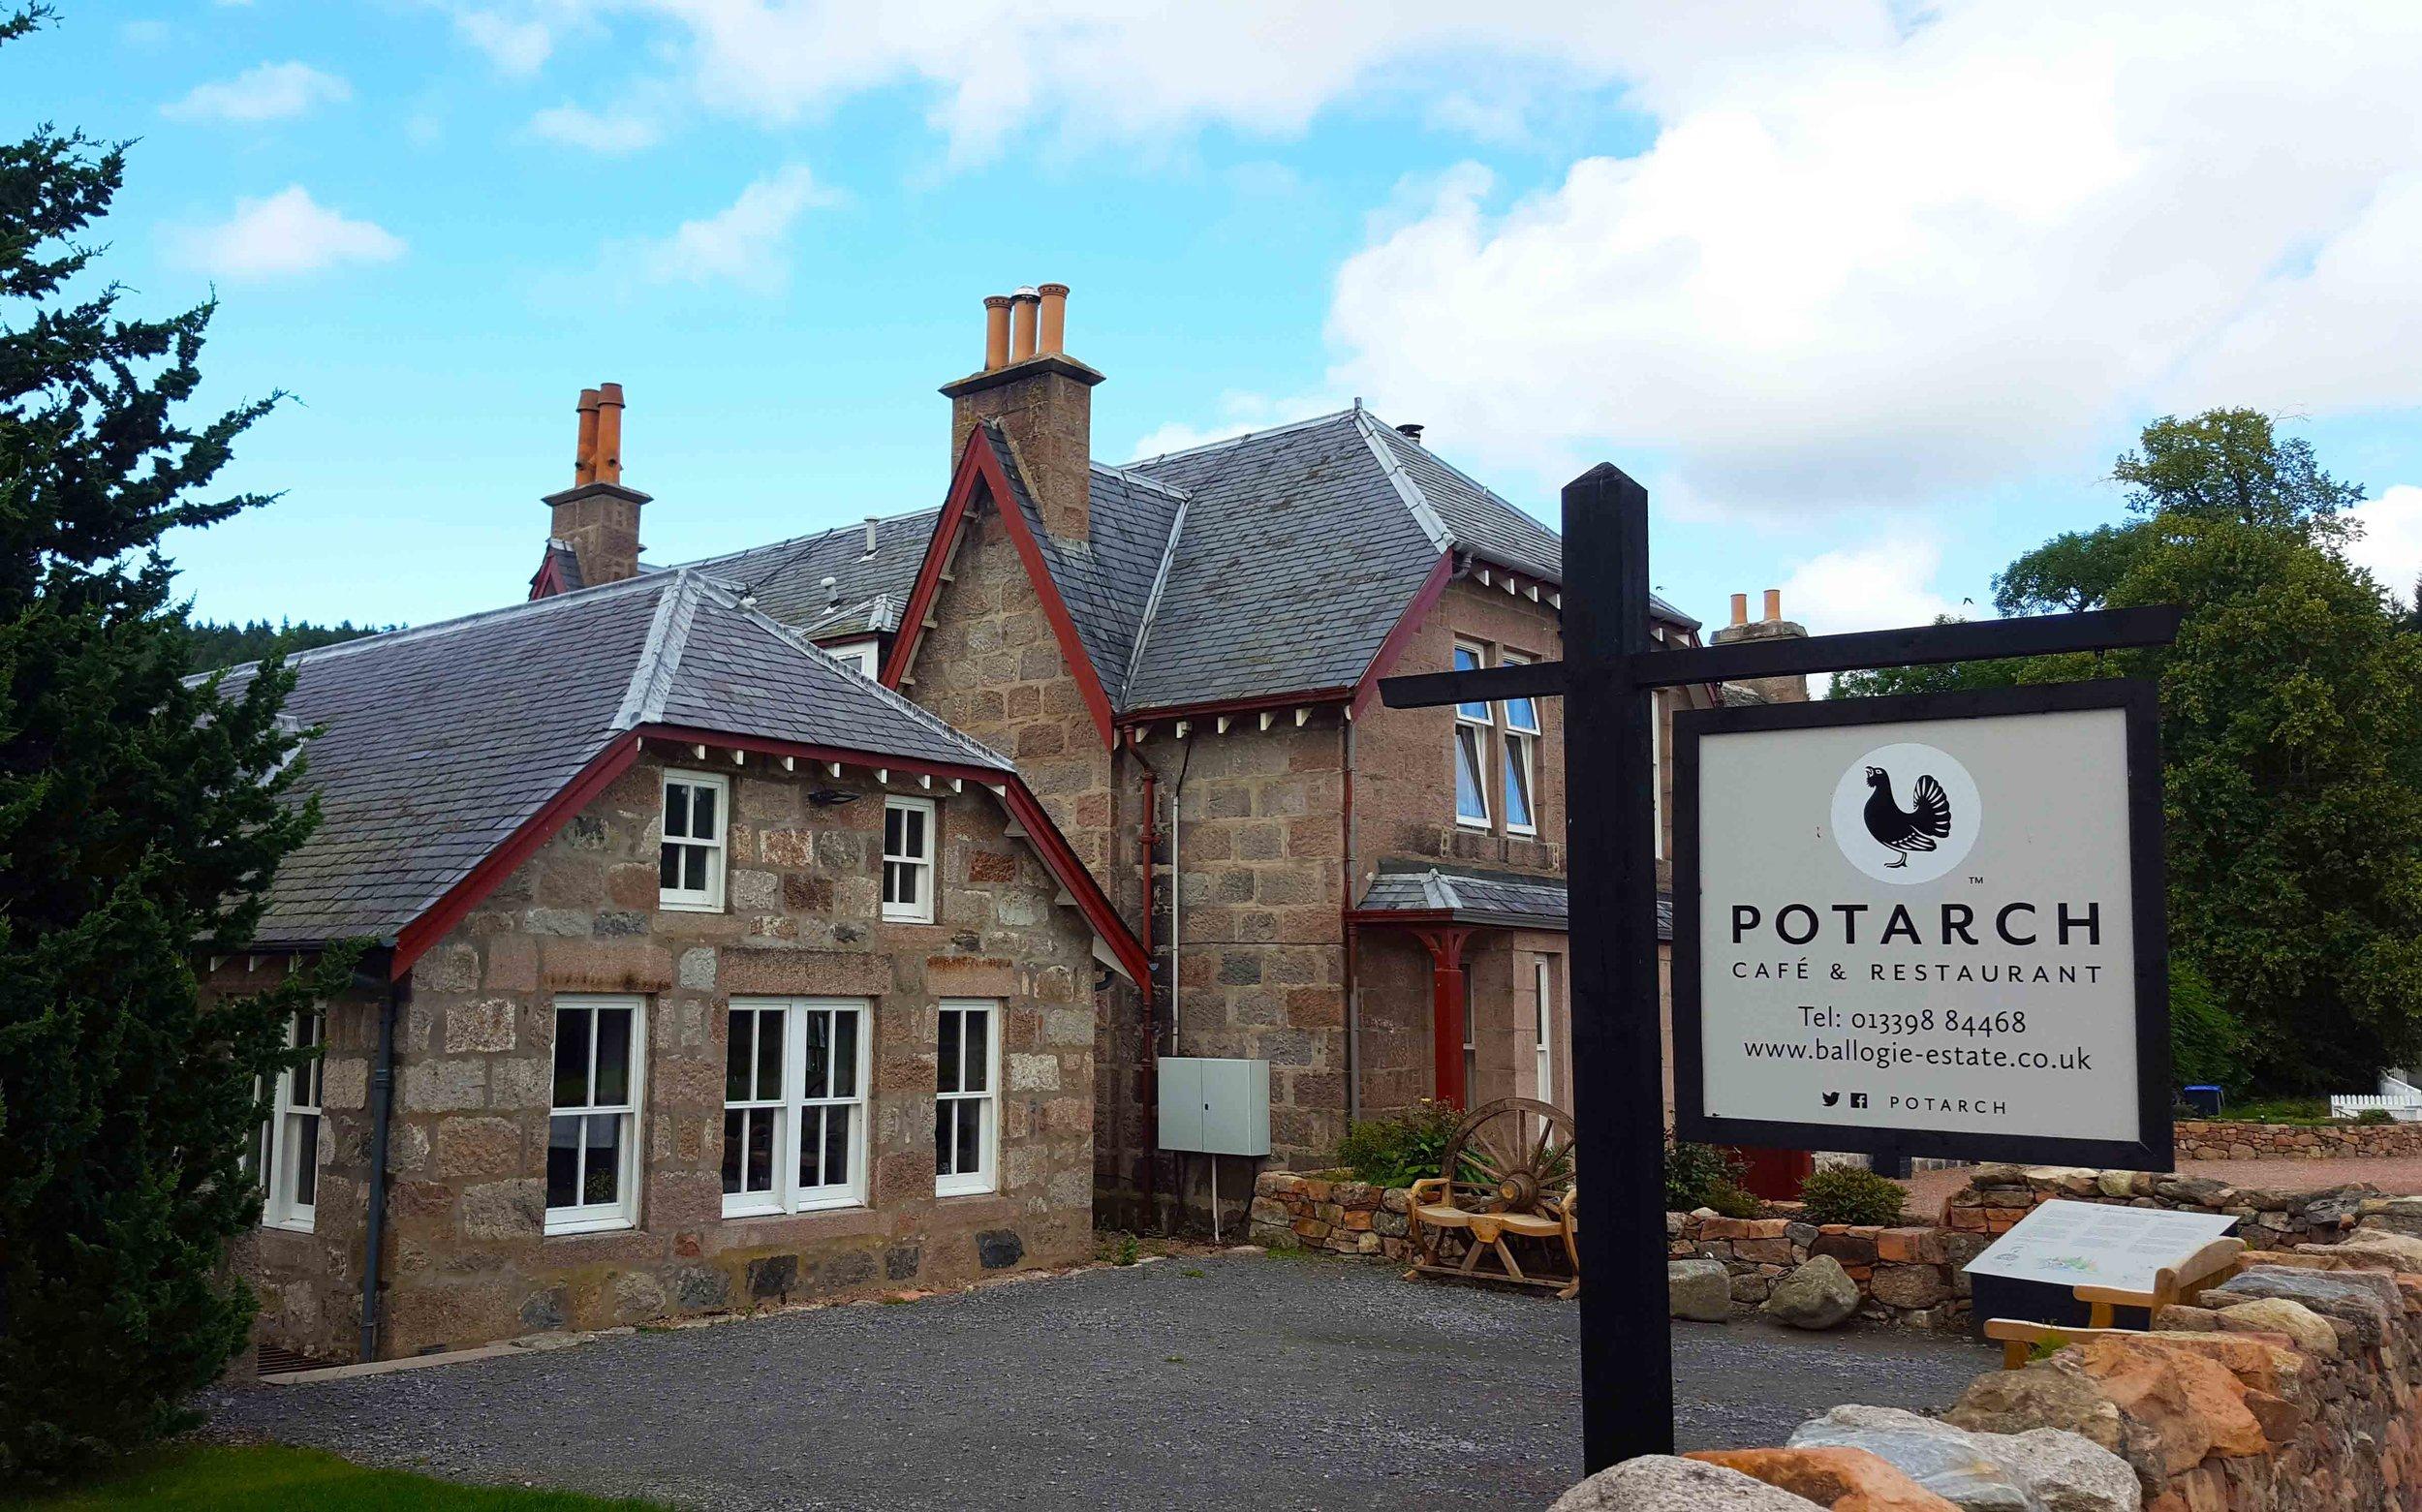 Potarch - Ballogie Estate, Aberdeenshire